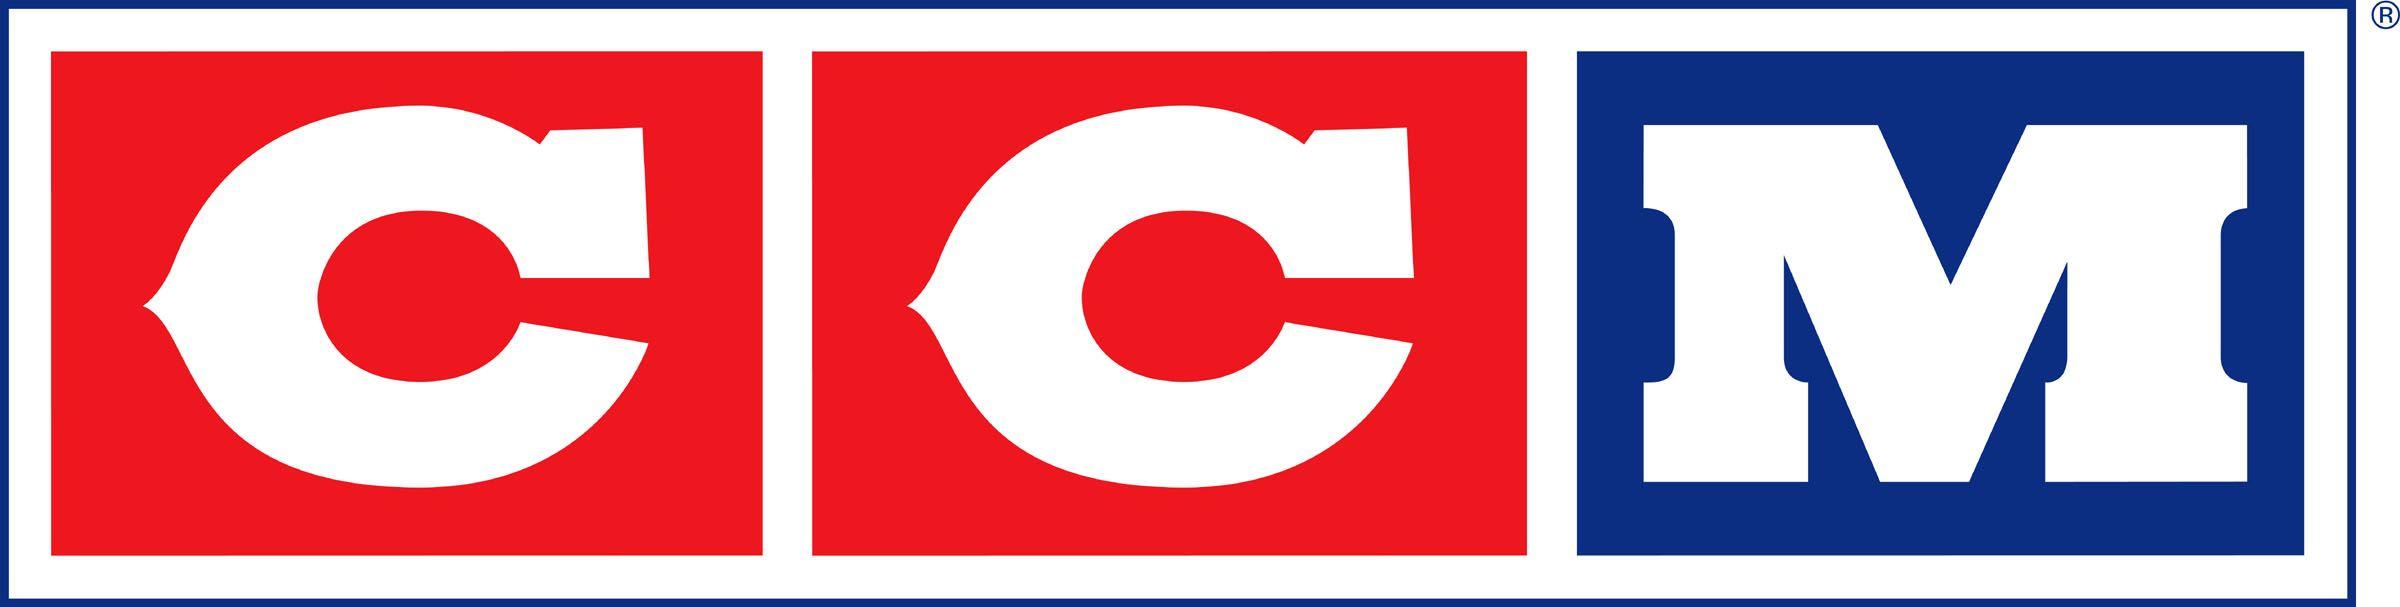 CCM Logo | He Shoots He Scores | Ccm hockey, Logos, Hockey ...